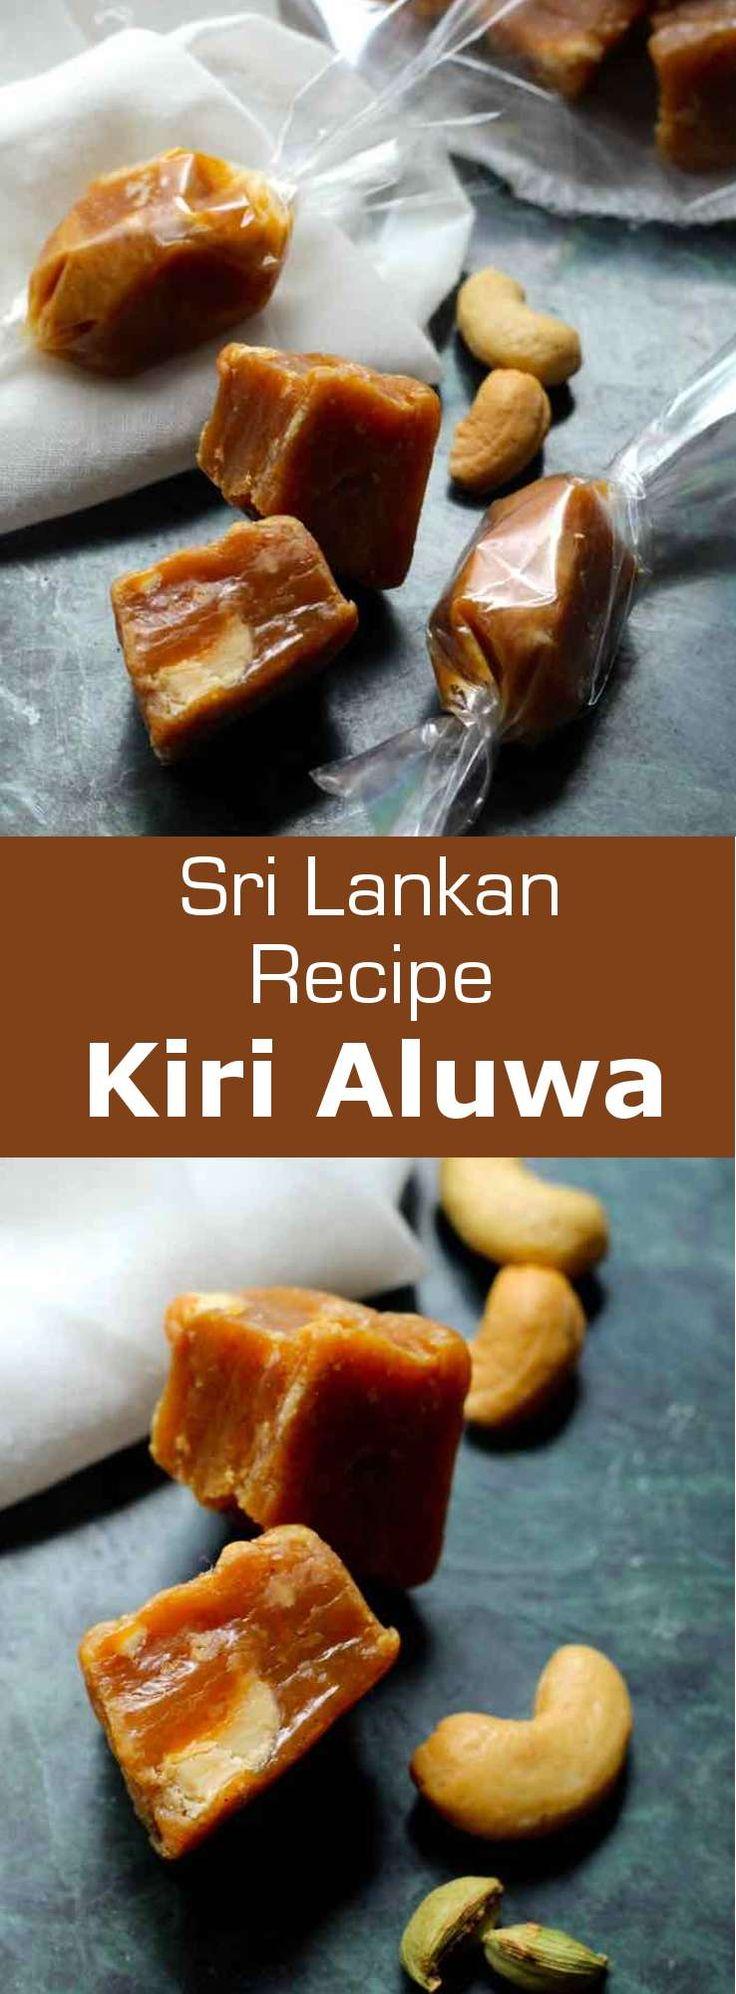 Kiri aluwa (milk toffee or kiri toffee) is a traditional recipe of delicious cardamom flavored soft toffee with crunchy cashew nuts, that is very popular in Sri Lanka. #SriLanka #SriLankanCuisine #SriLankanDessert #Dessert #DessertRecipe #SriLankanRecipe #Toffee #ToffeeRecipe #WorldCuisine #196flavors via @196flavors